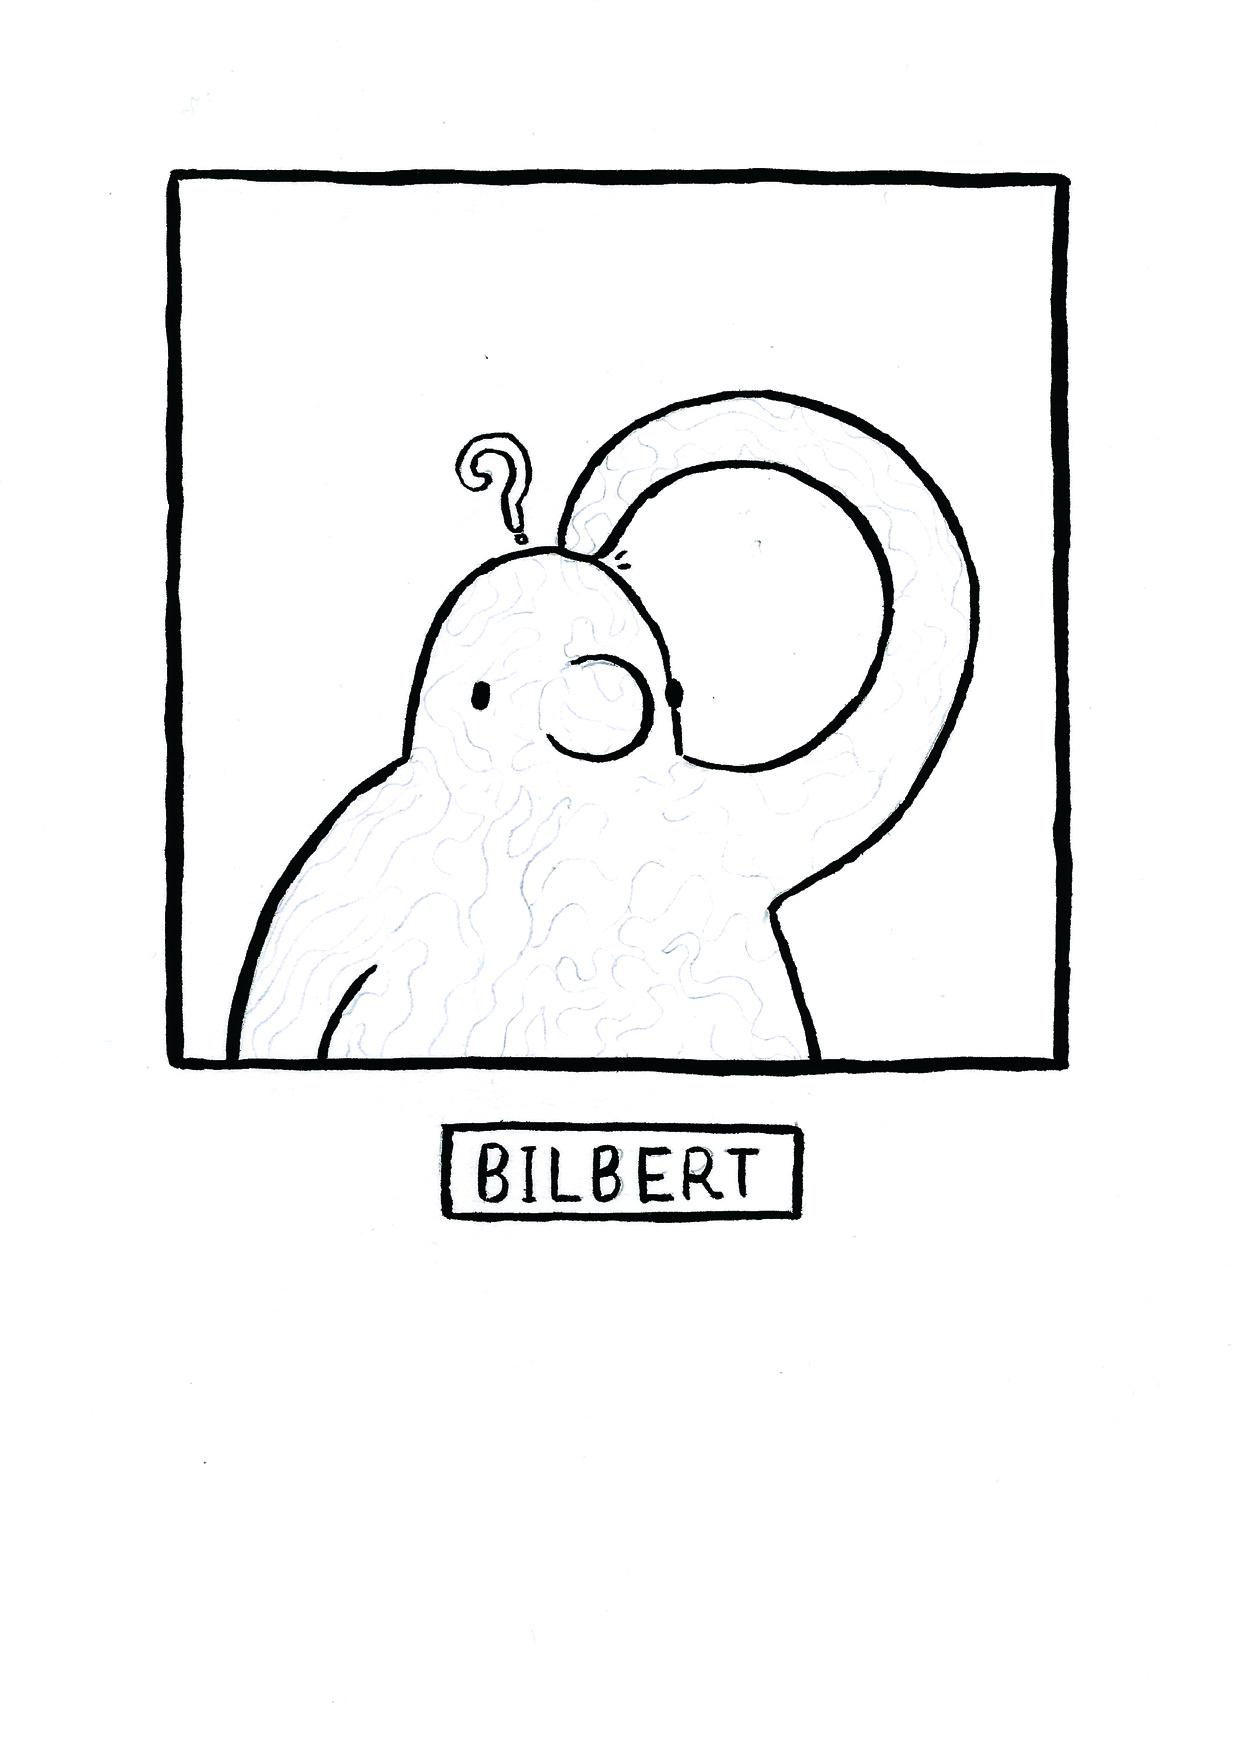 Bilbert